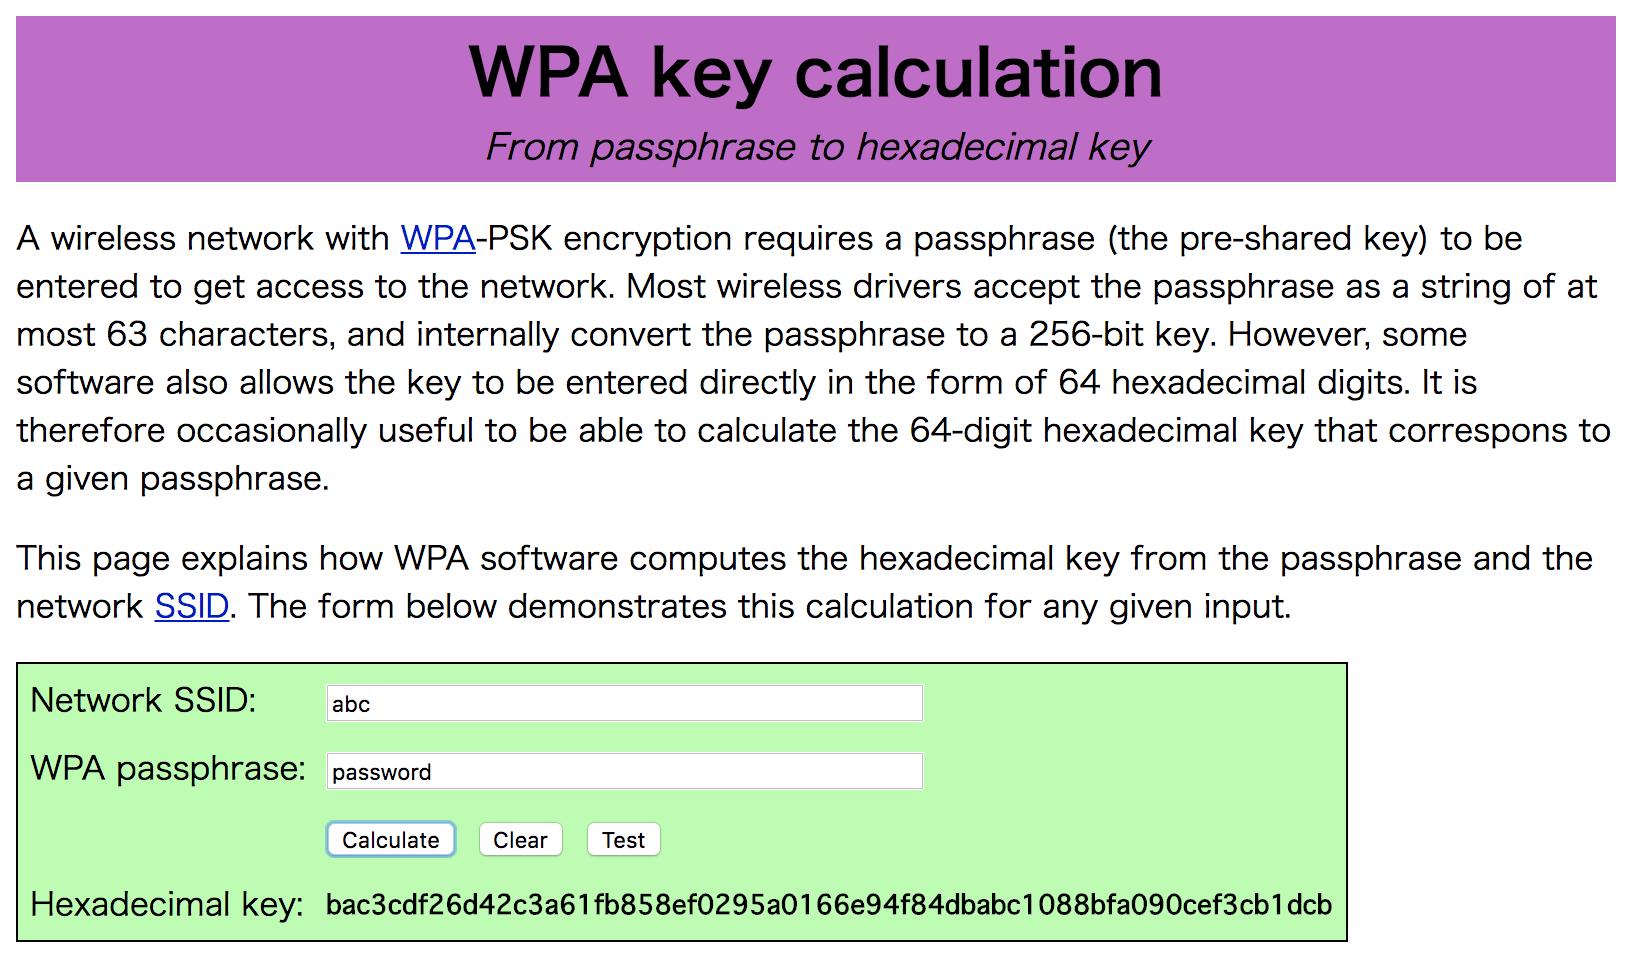 WPA key calculation